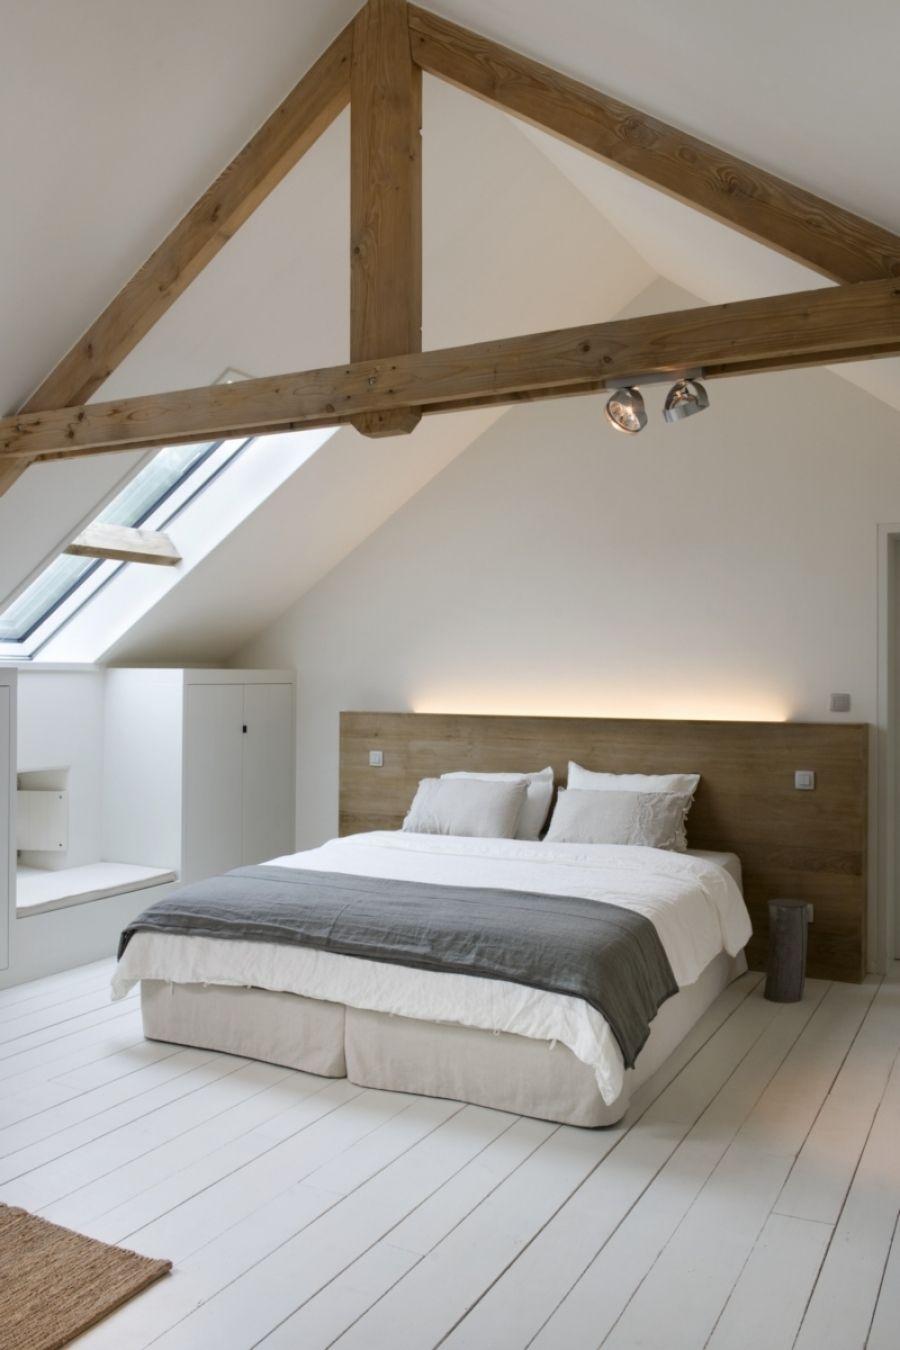 bb factorij 10 slaapkamer onder dak stefanie bodart